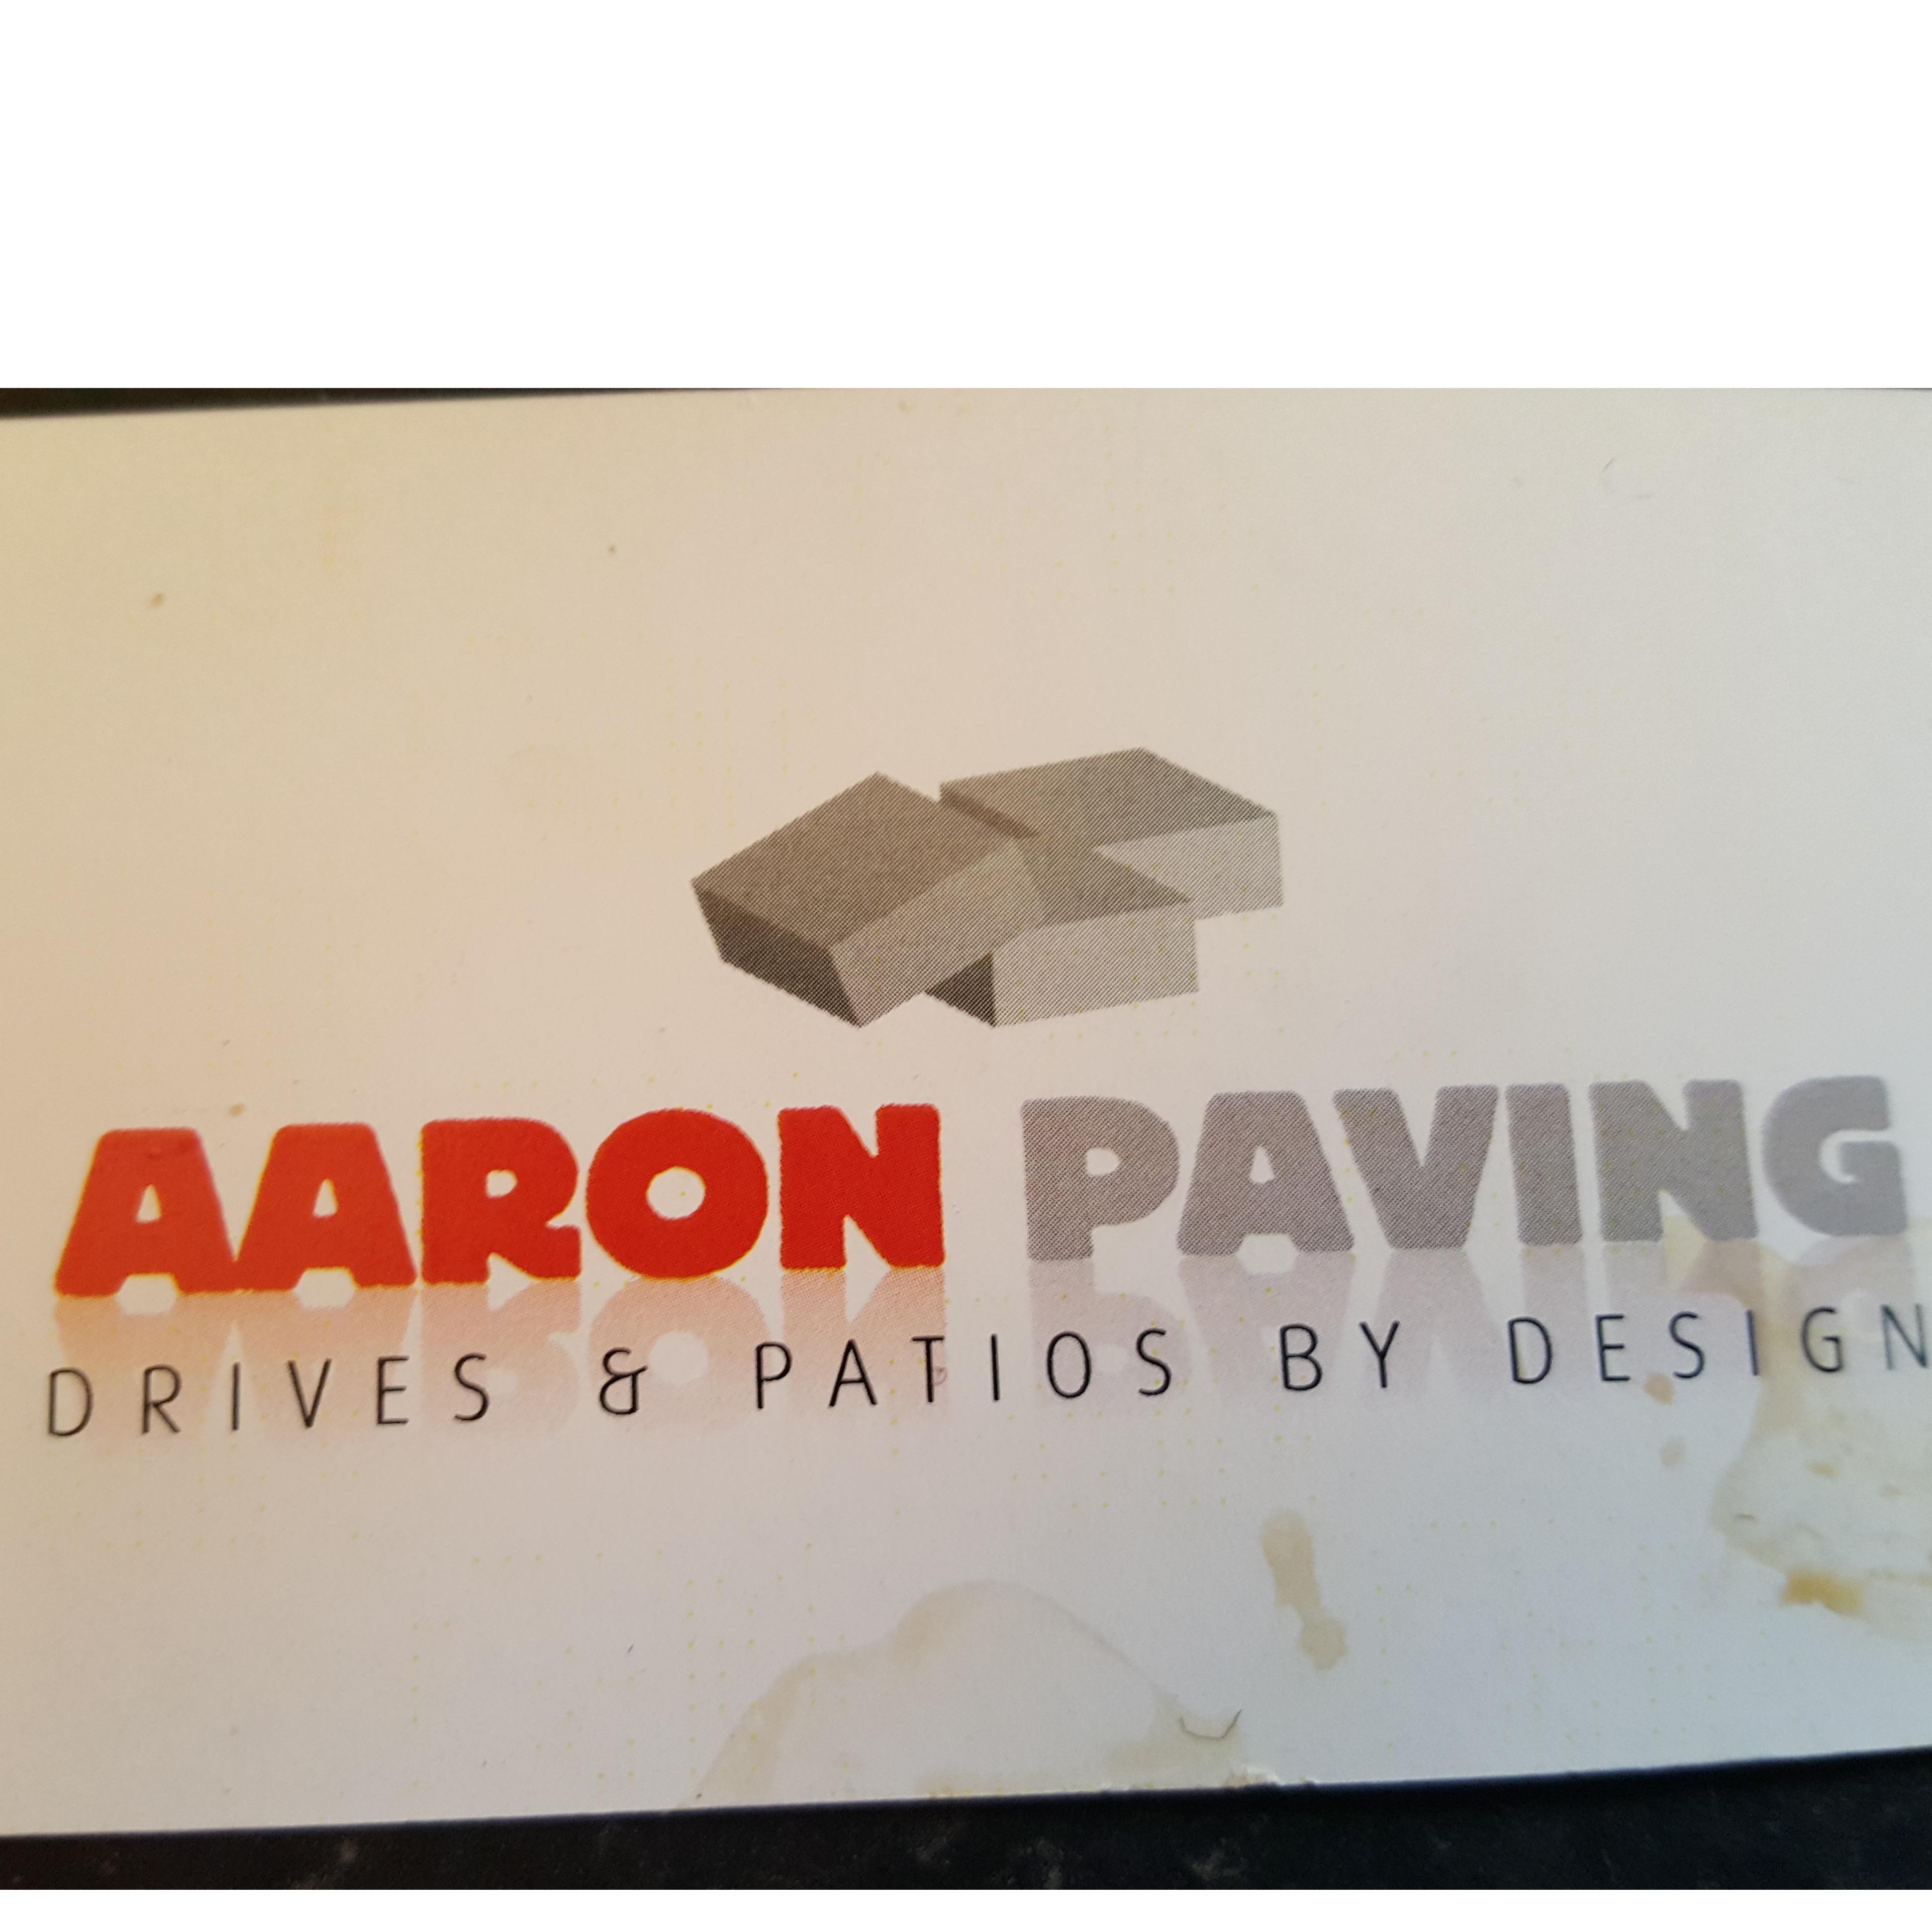 Aaron Paving